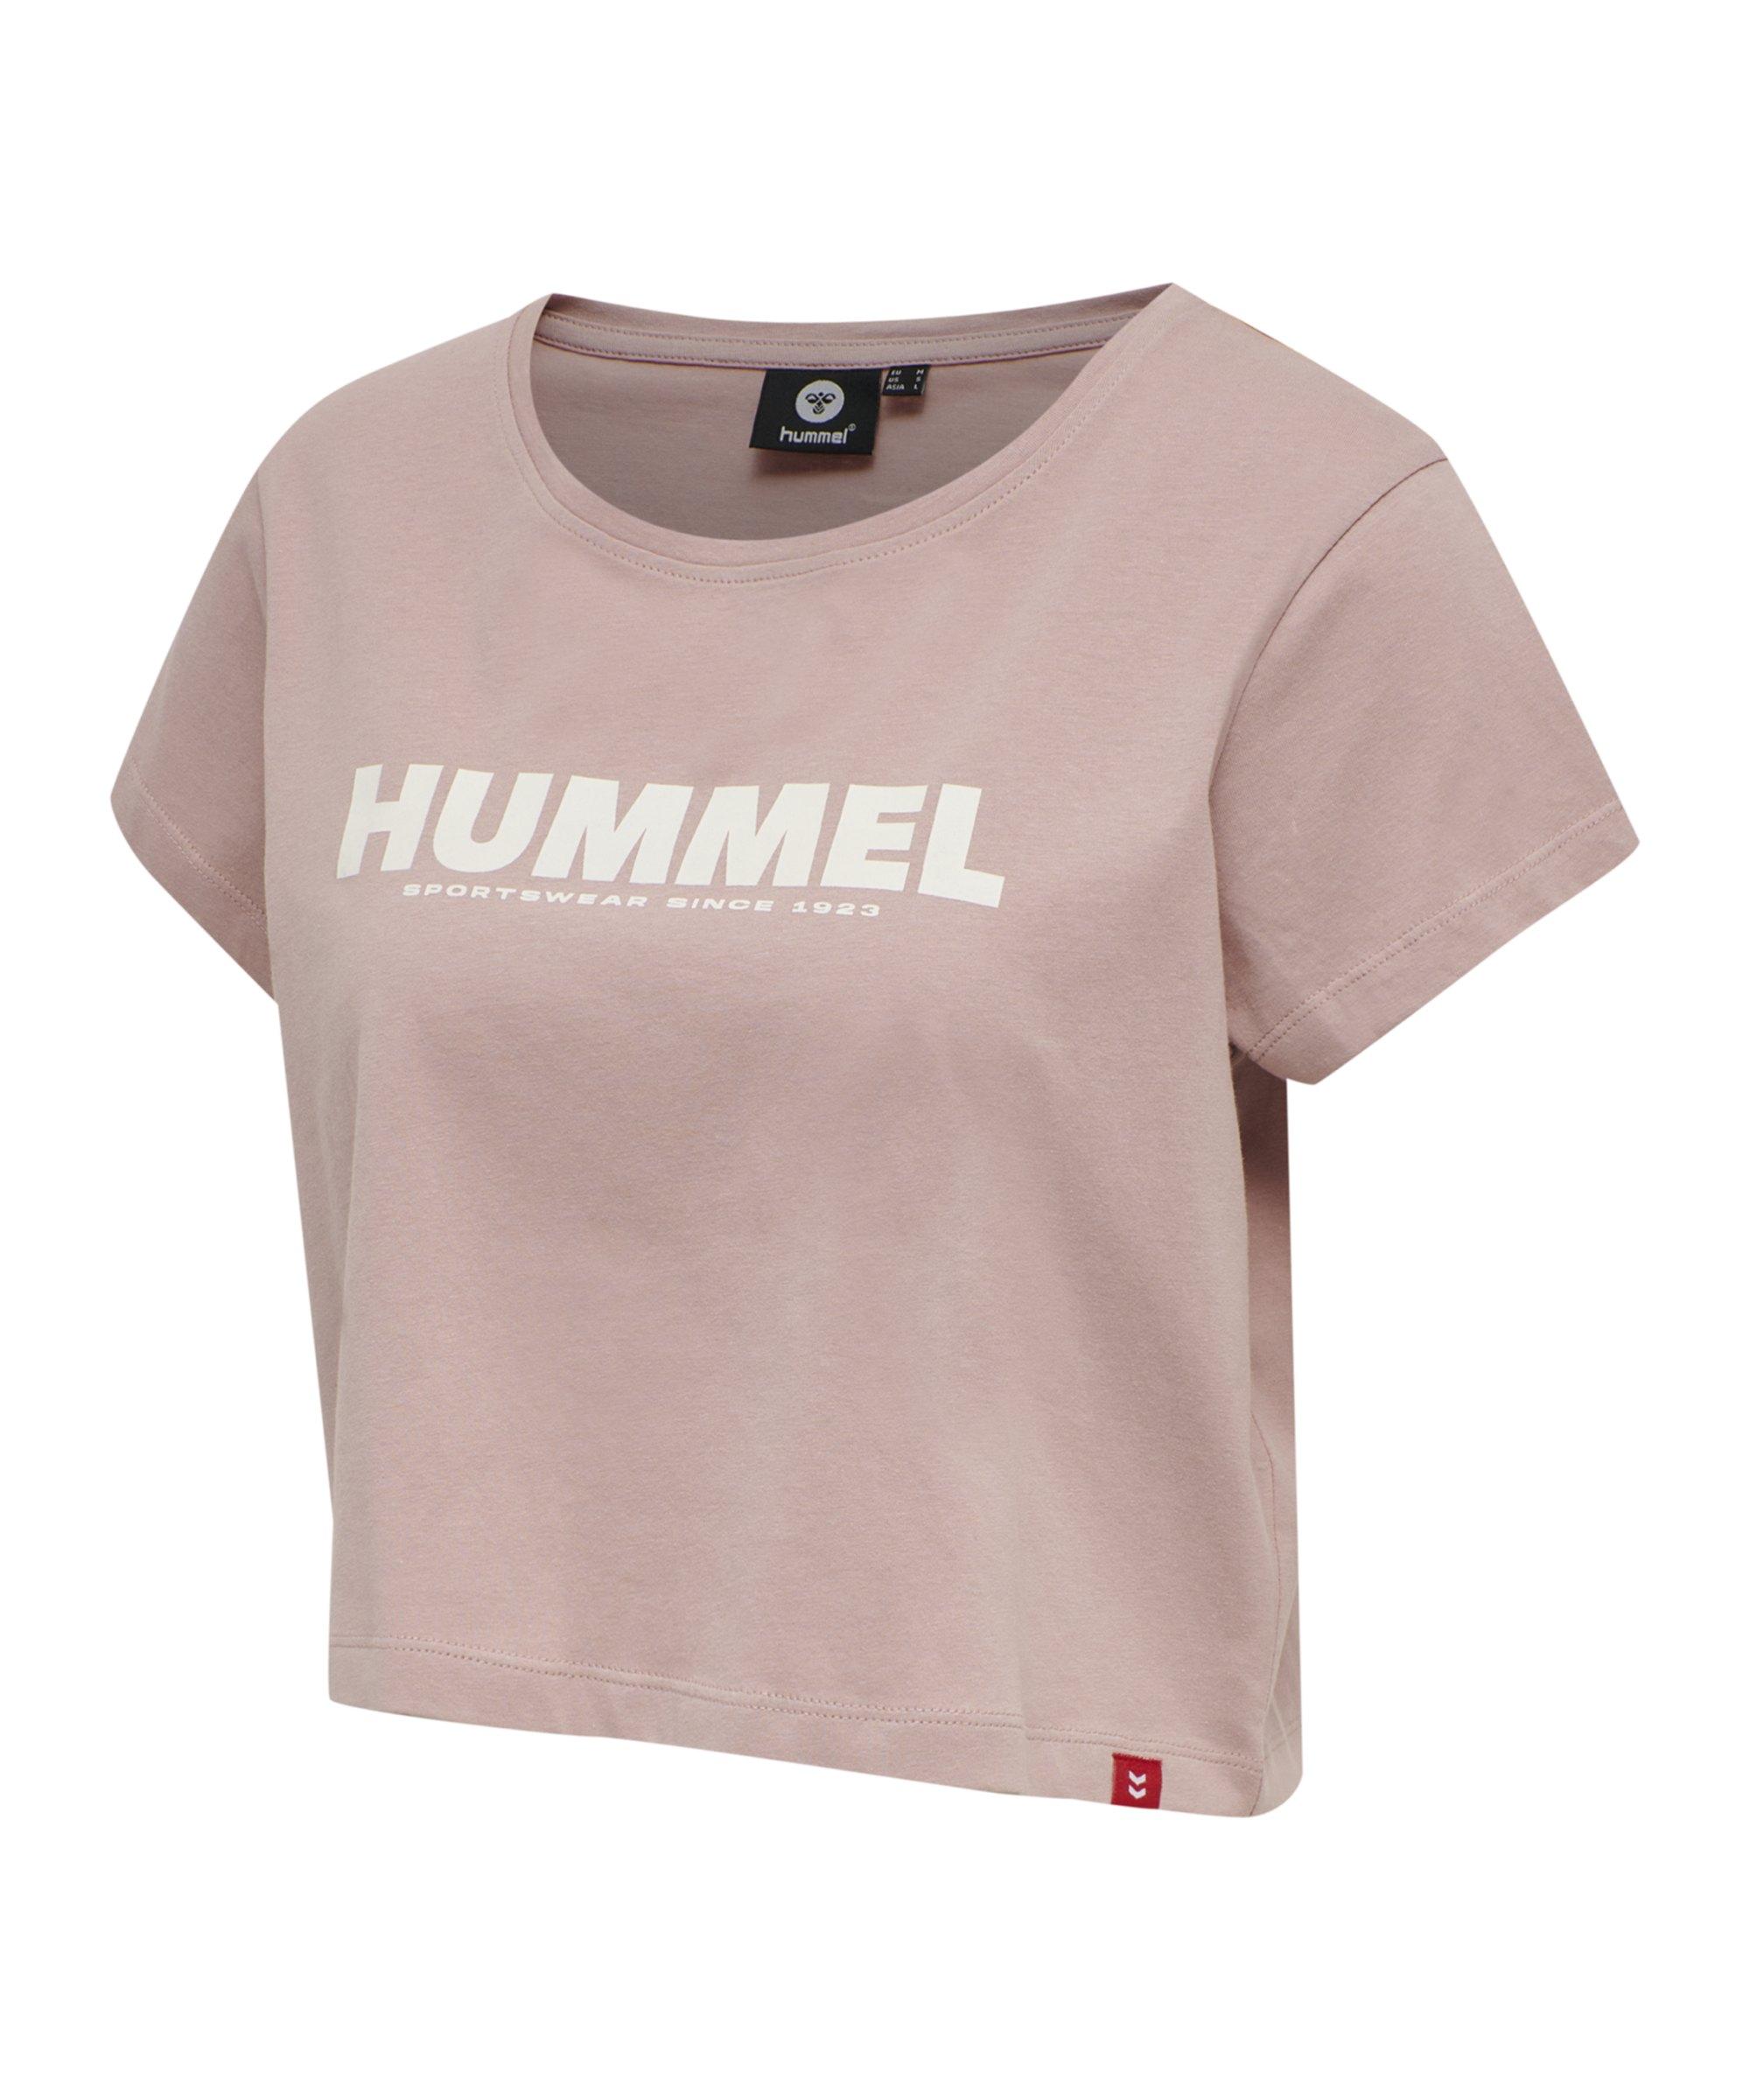 Hummel Legacy Cropped T-Shirt Damen Rosa F4852 - rosa